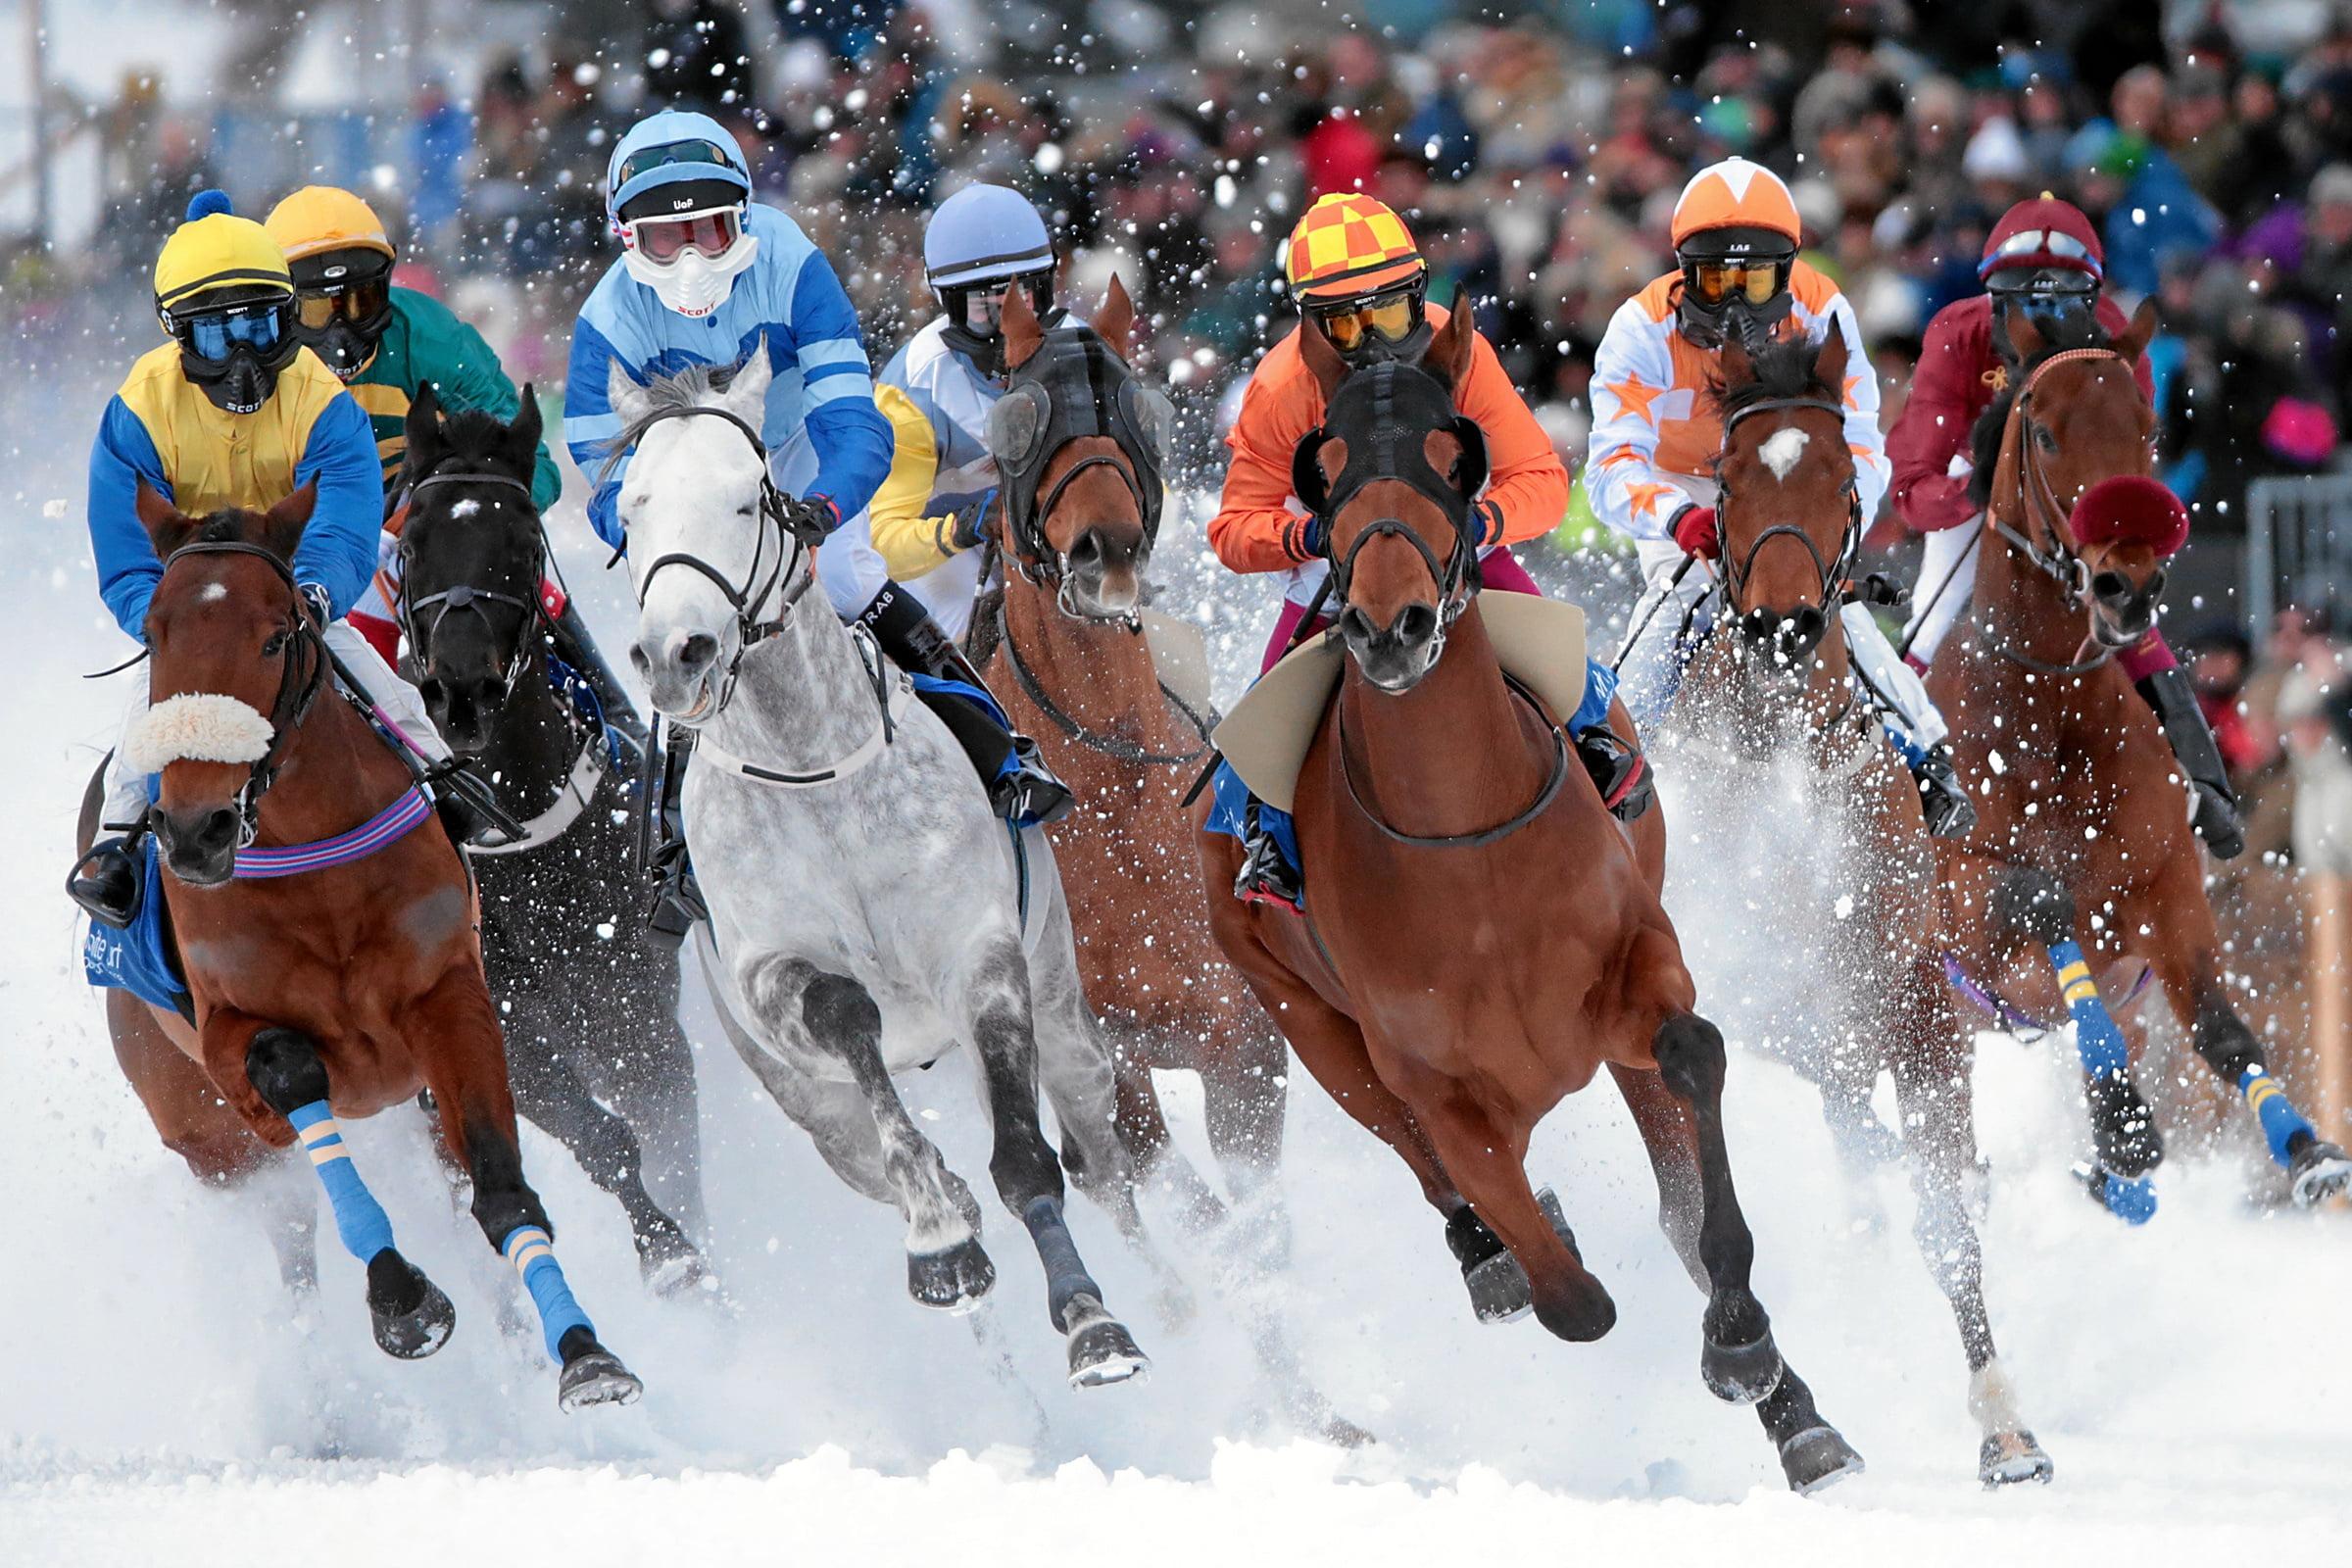 White Turf St. Moritz - International Horse Races on Snow since 1907